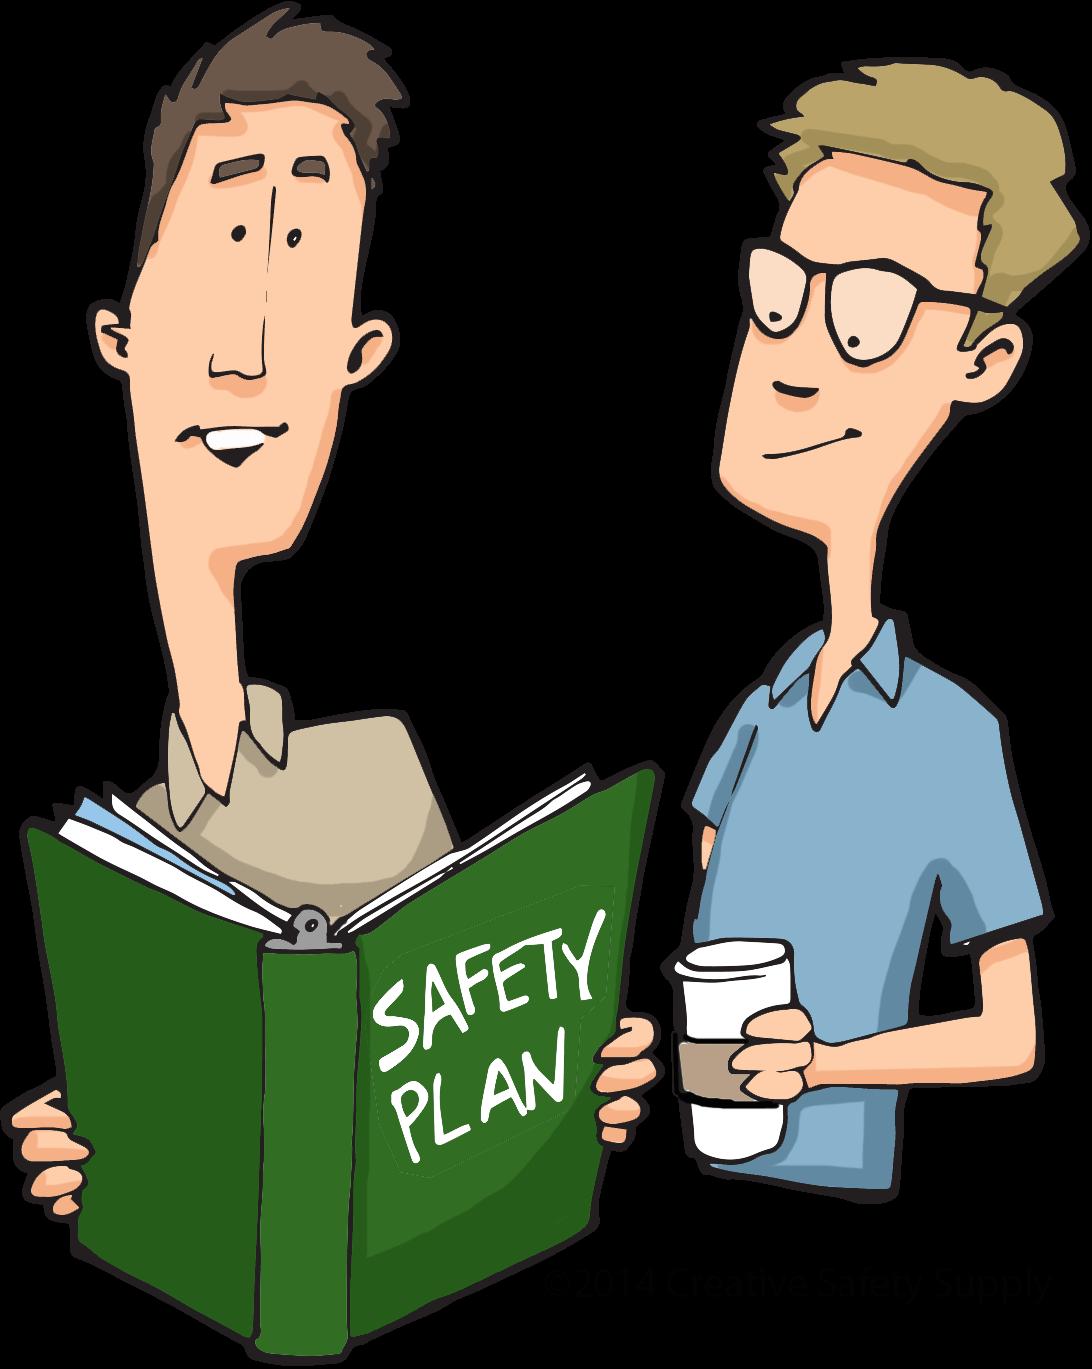 Safety Supervisors Safety Plan